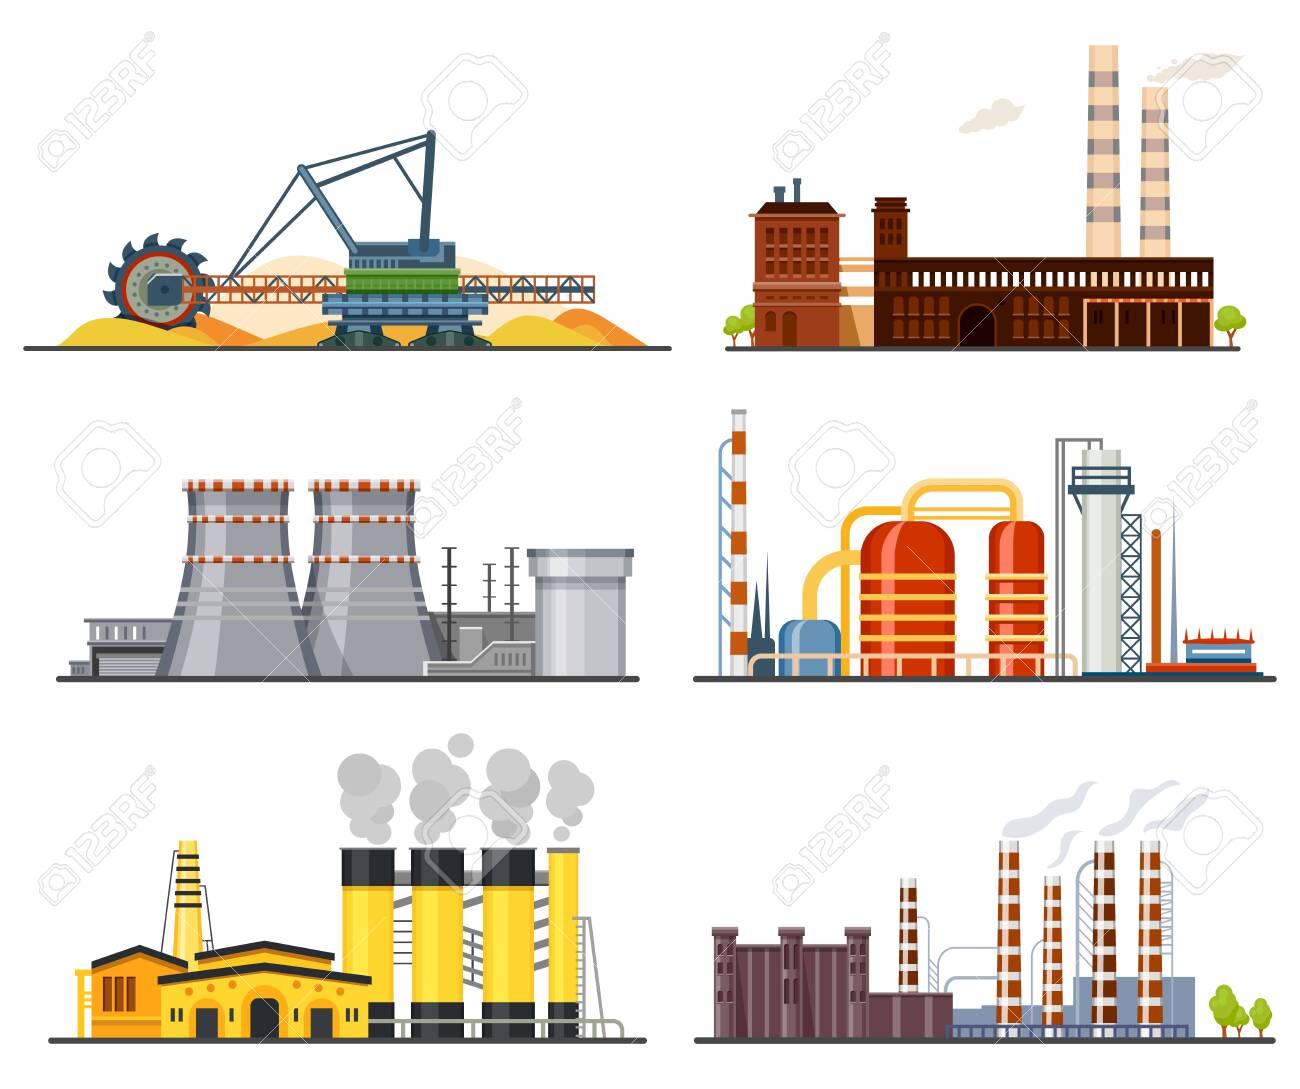 Factories or industrial plants, heavy industry set - 141307056